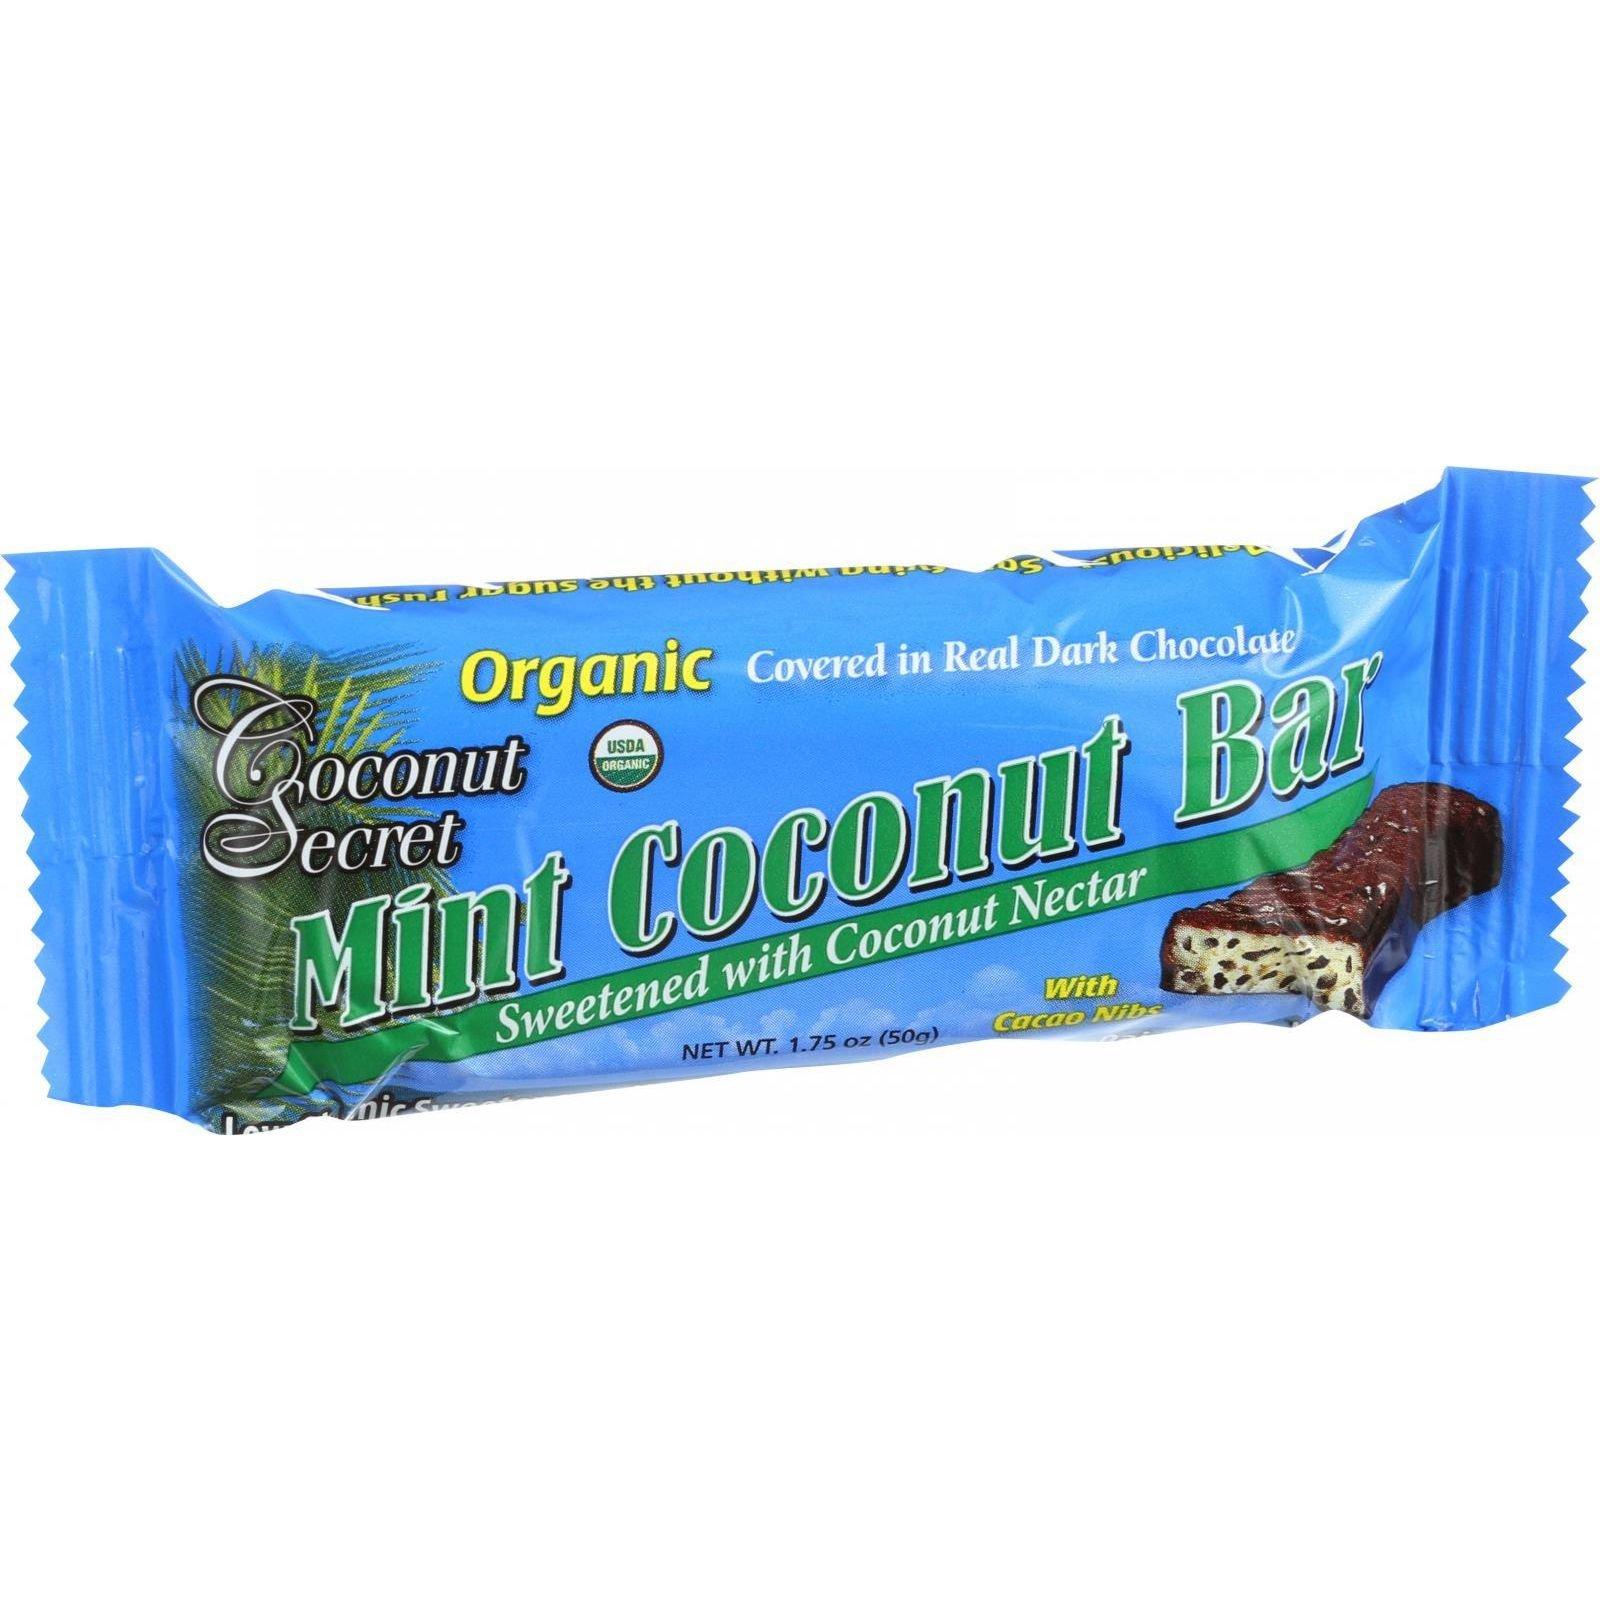 Amazon.com: Mint Coconut Bar, 1.75 oz. Bars, 12 count: Beauty